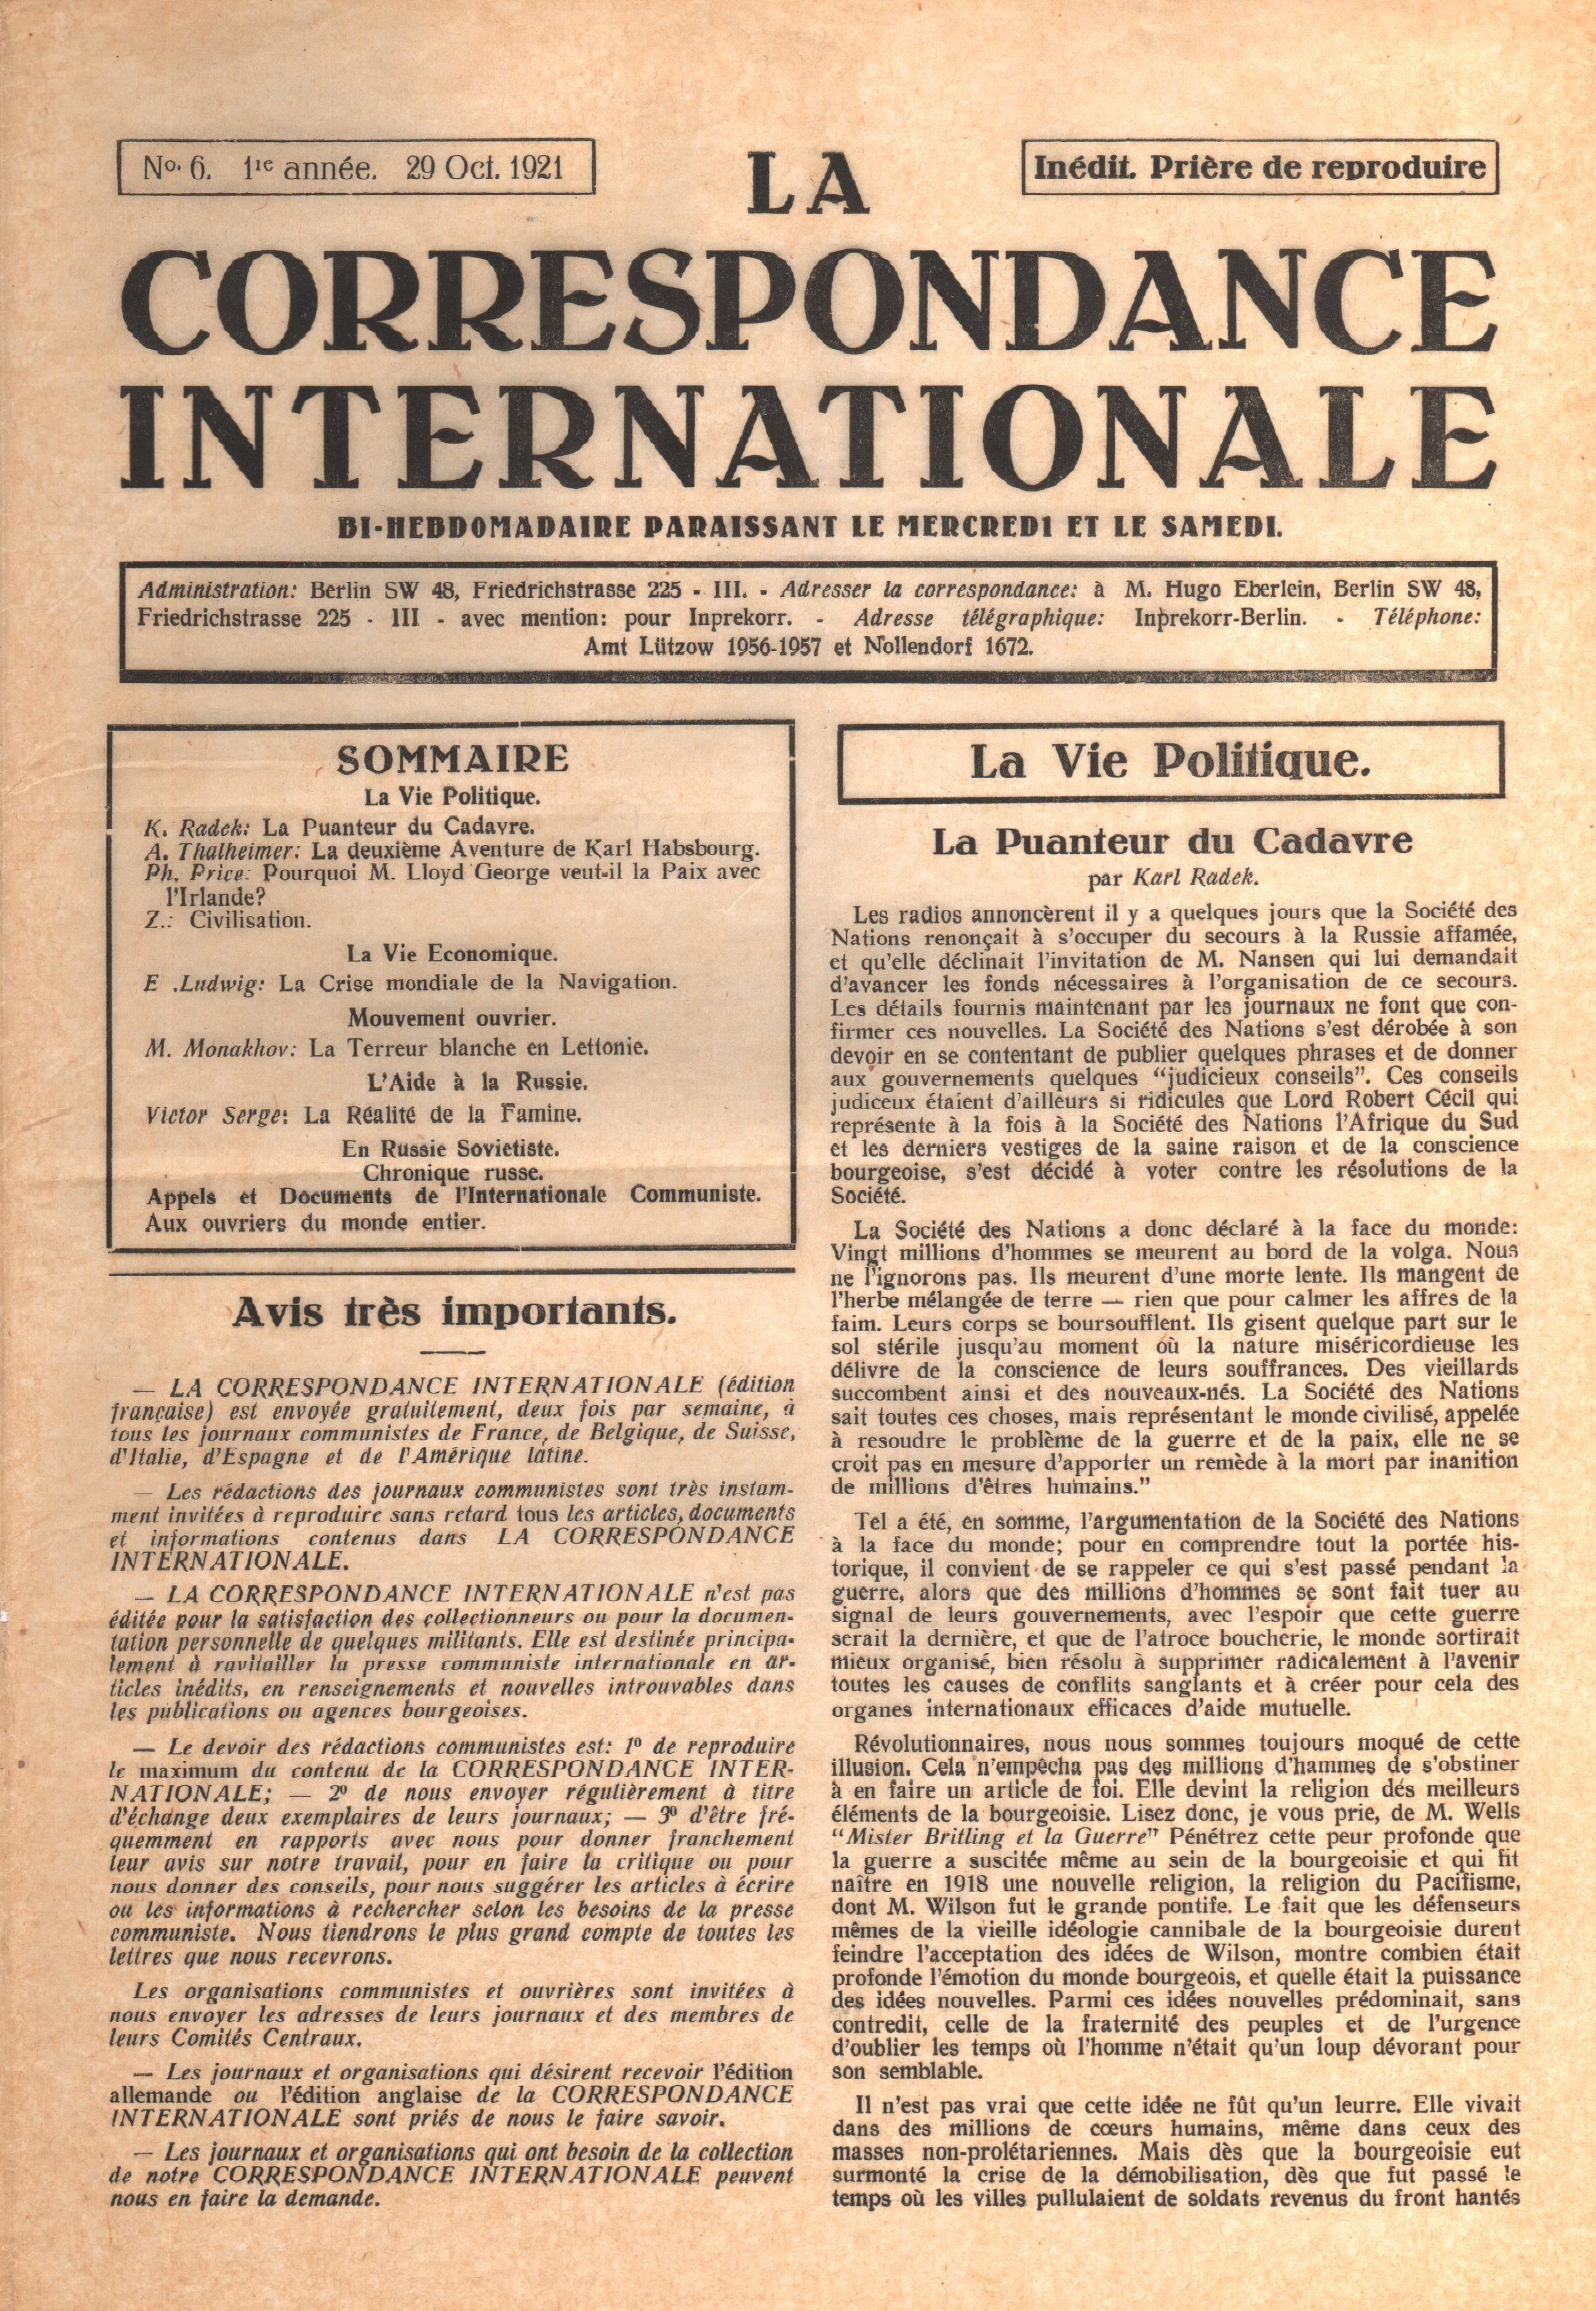 Correspondance Internationale n.6 - pag. 1